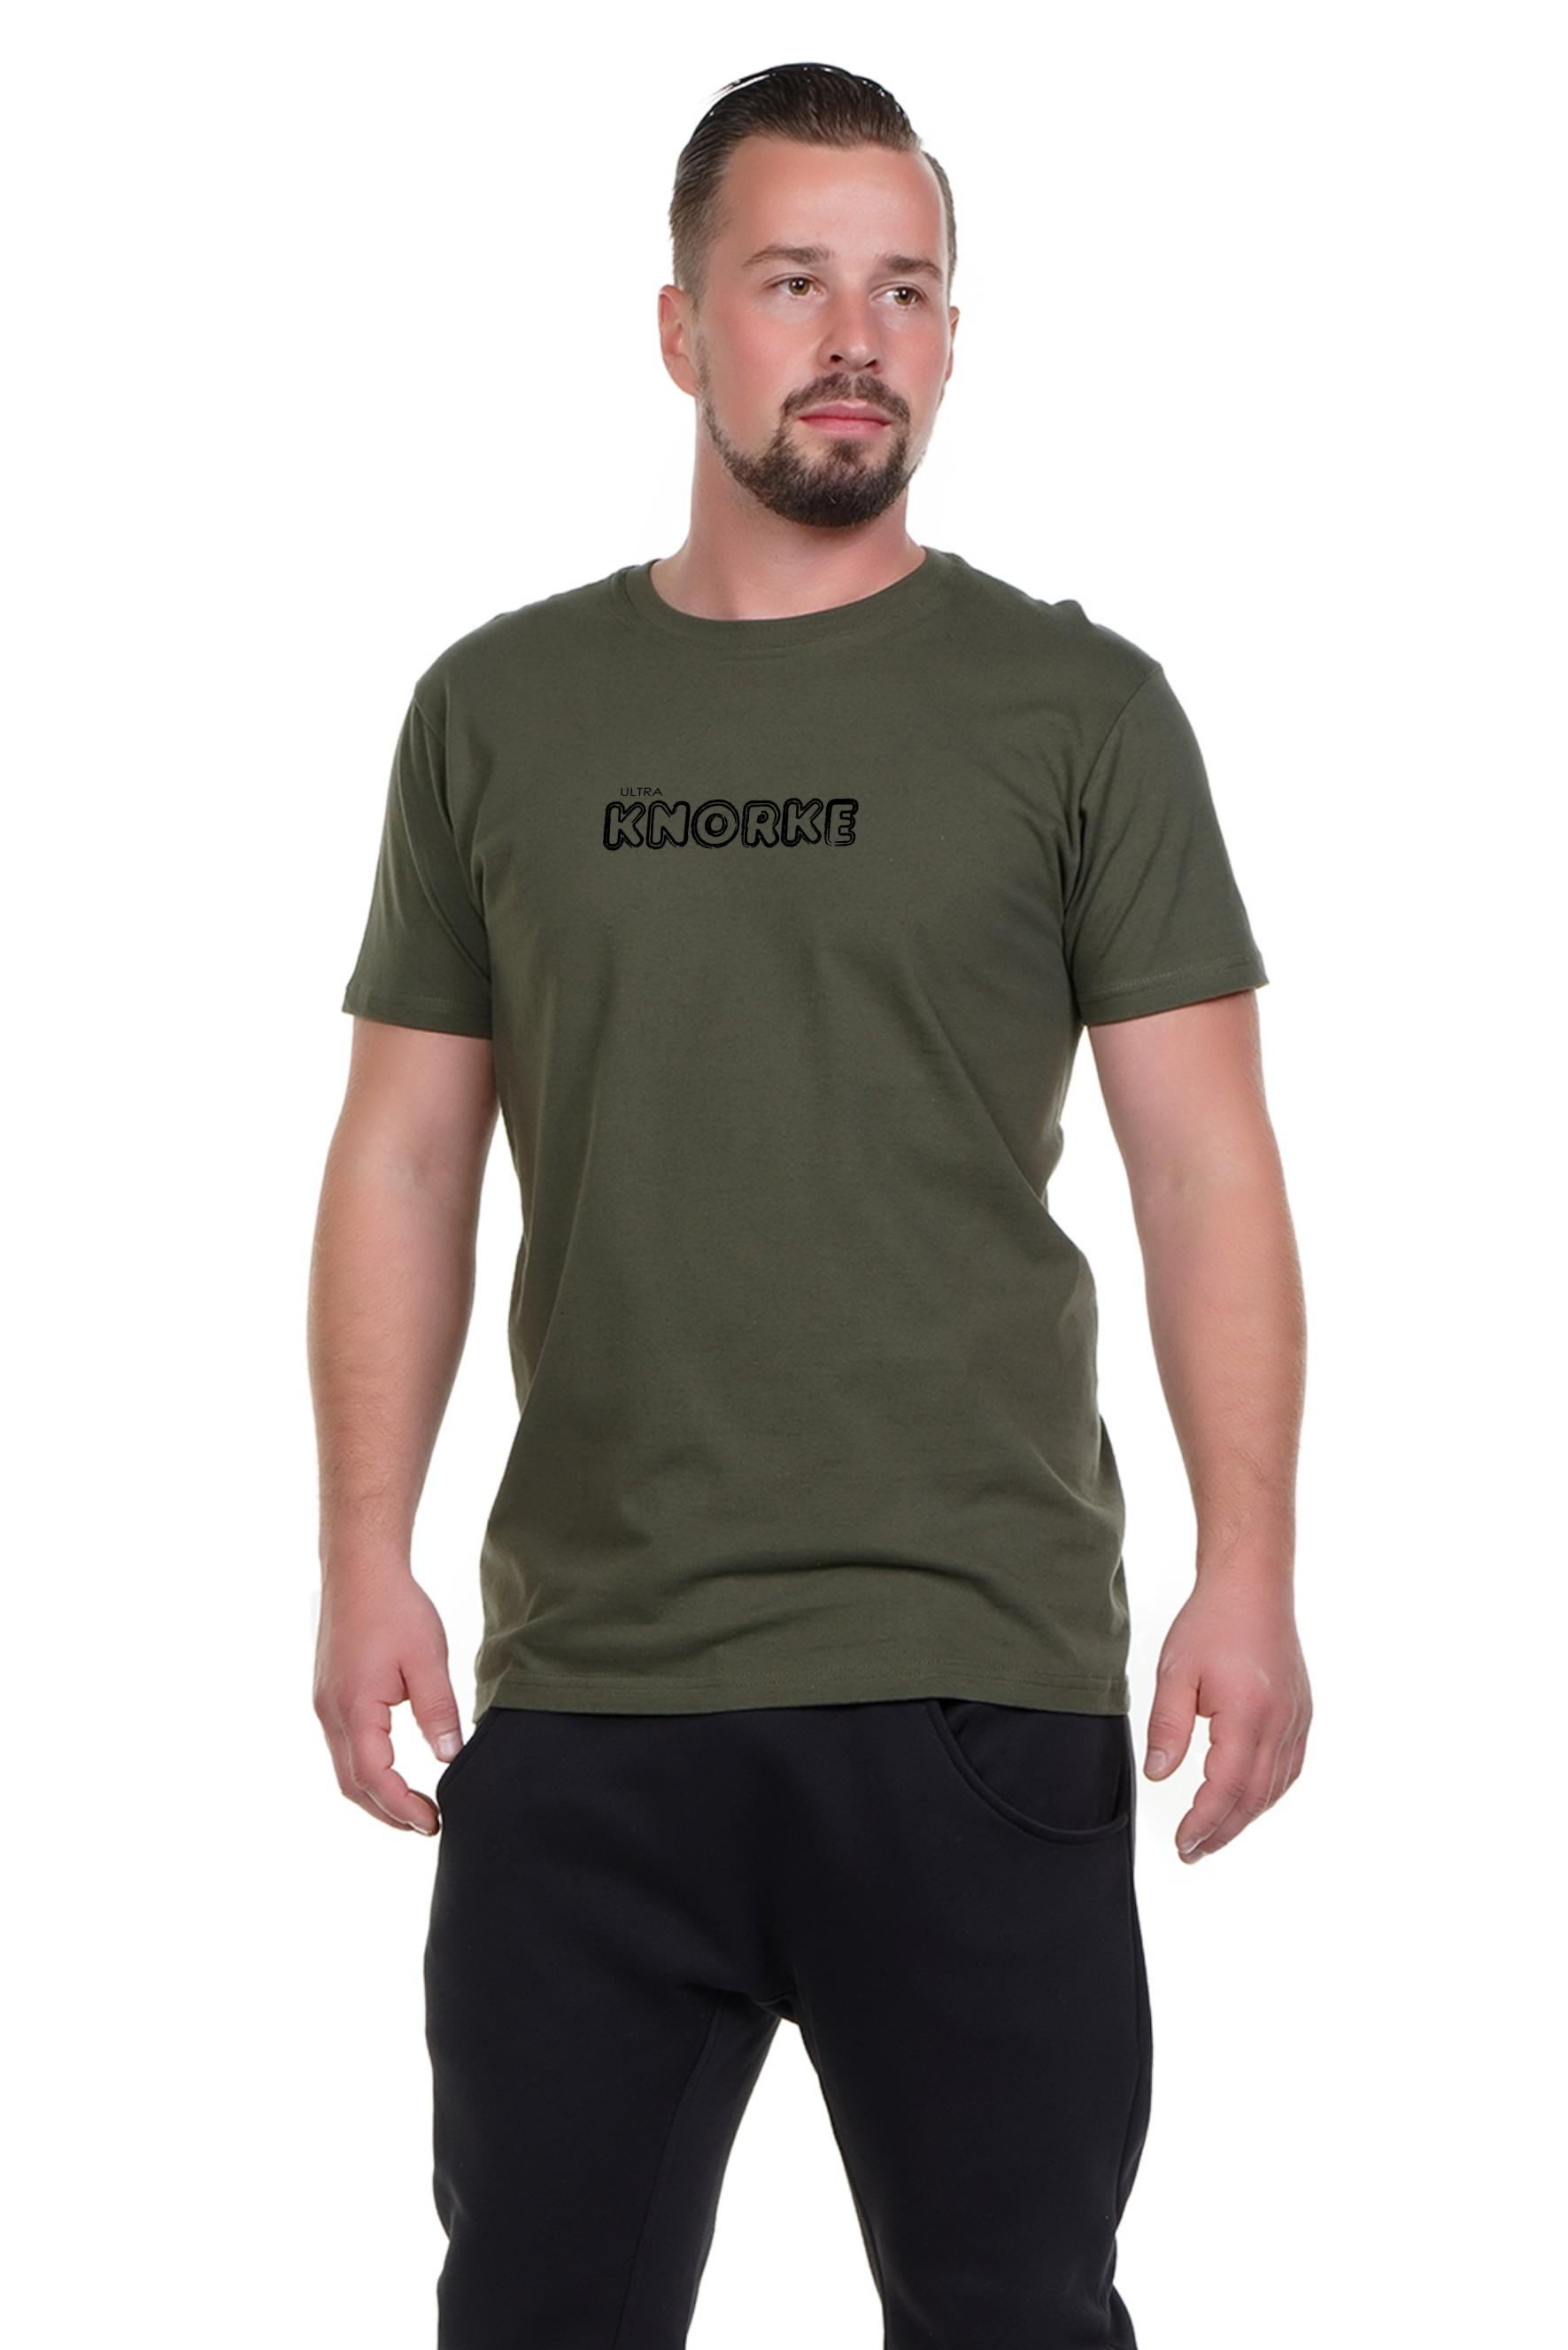 Spree Shirt Männer oliv Ultra Knorke